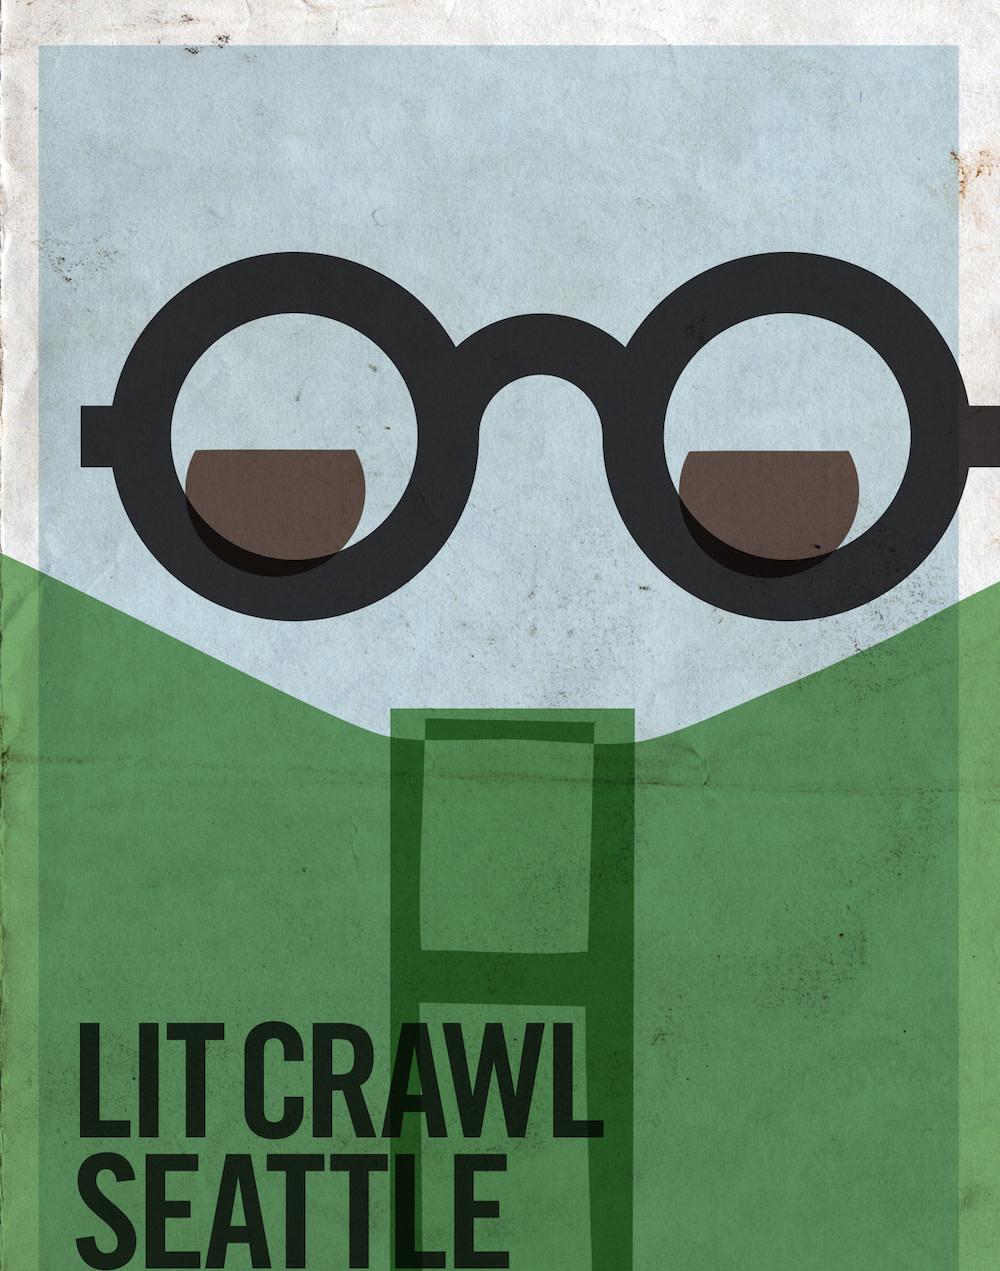 Lit crawl seattle ns6wi9